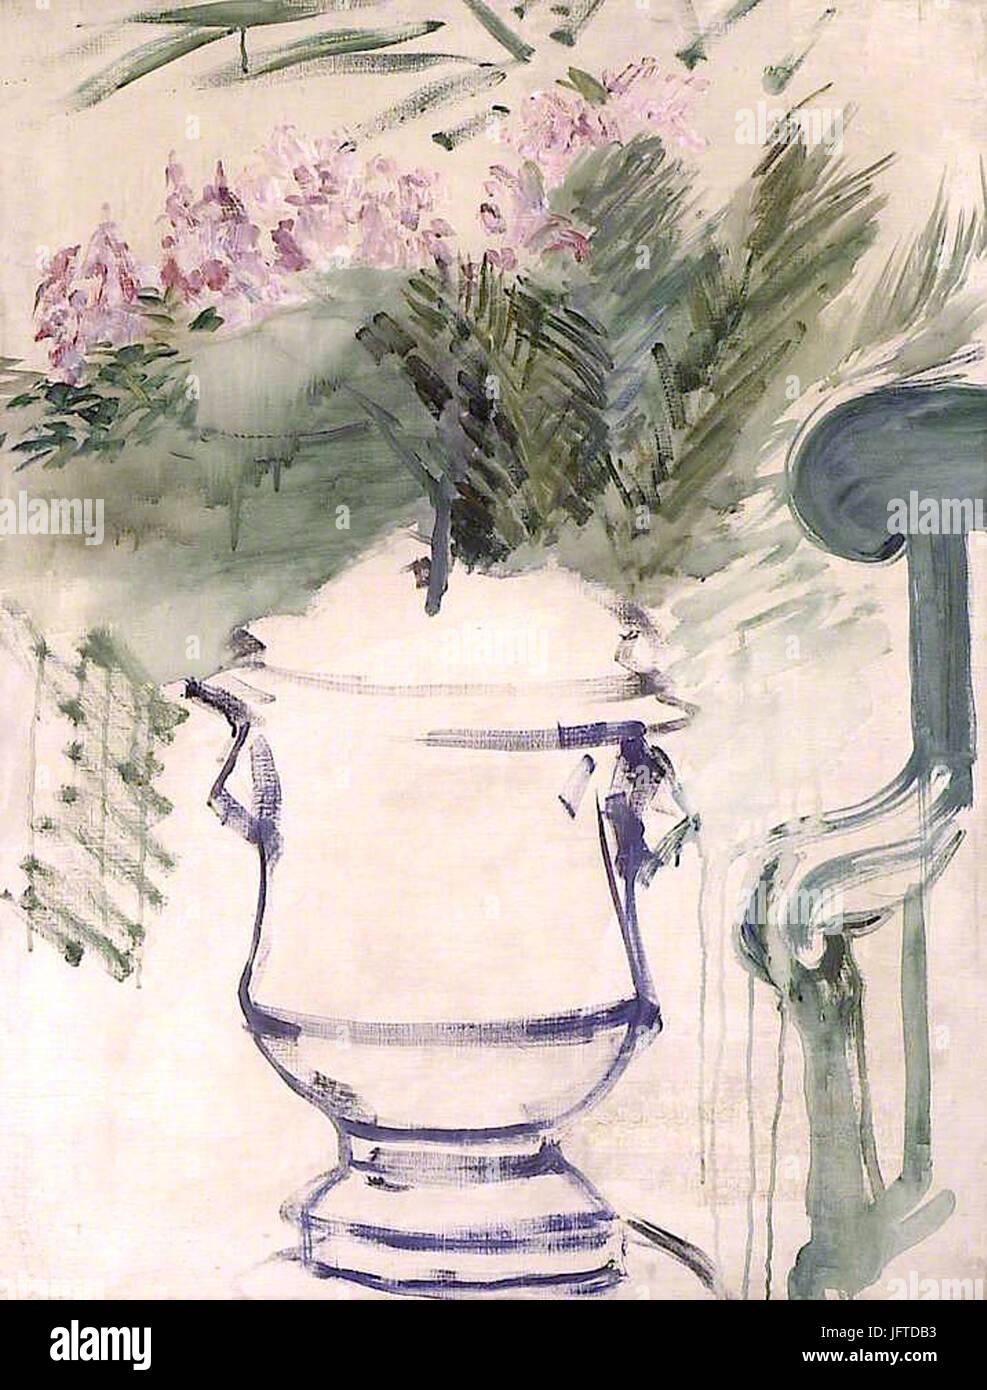 Édouard Manet - Vase de jardin (RW 288) - Stock Image